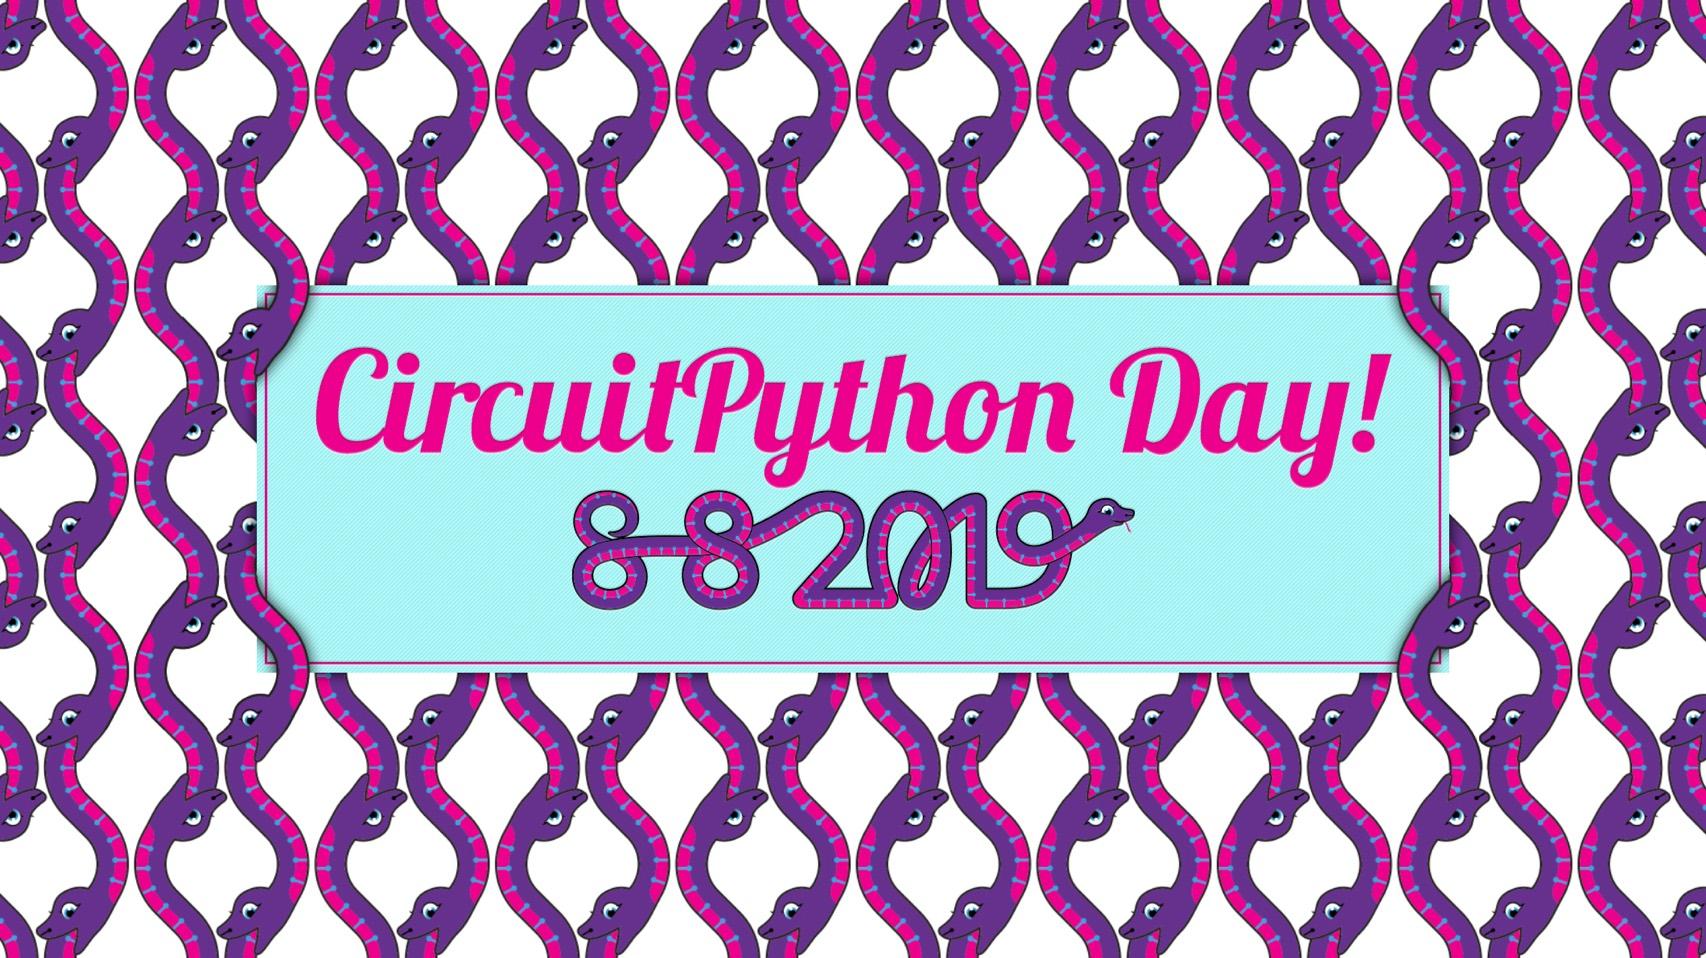 Adafruit 8 8 Circuit Python Day Fb Ig 2